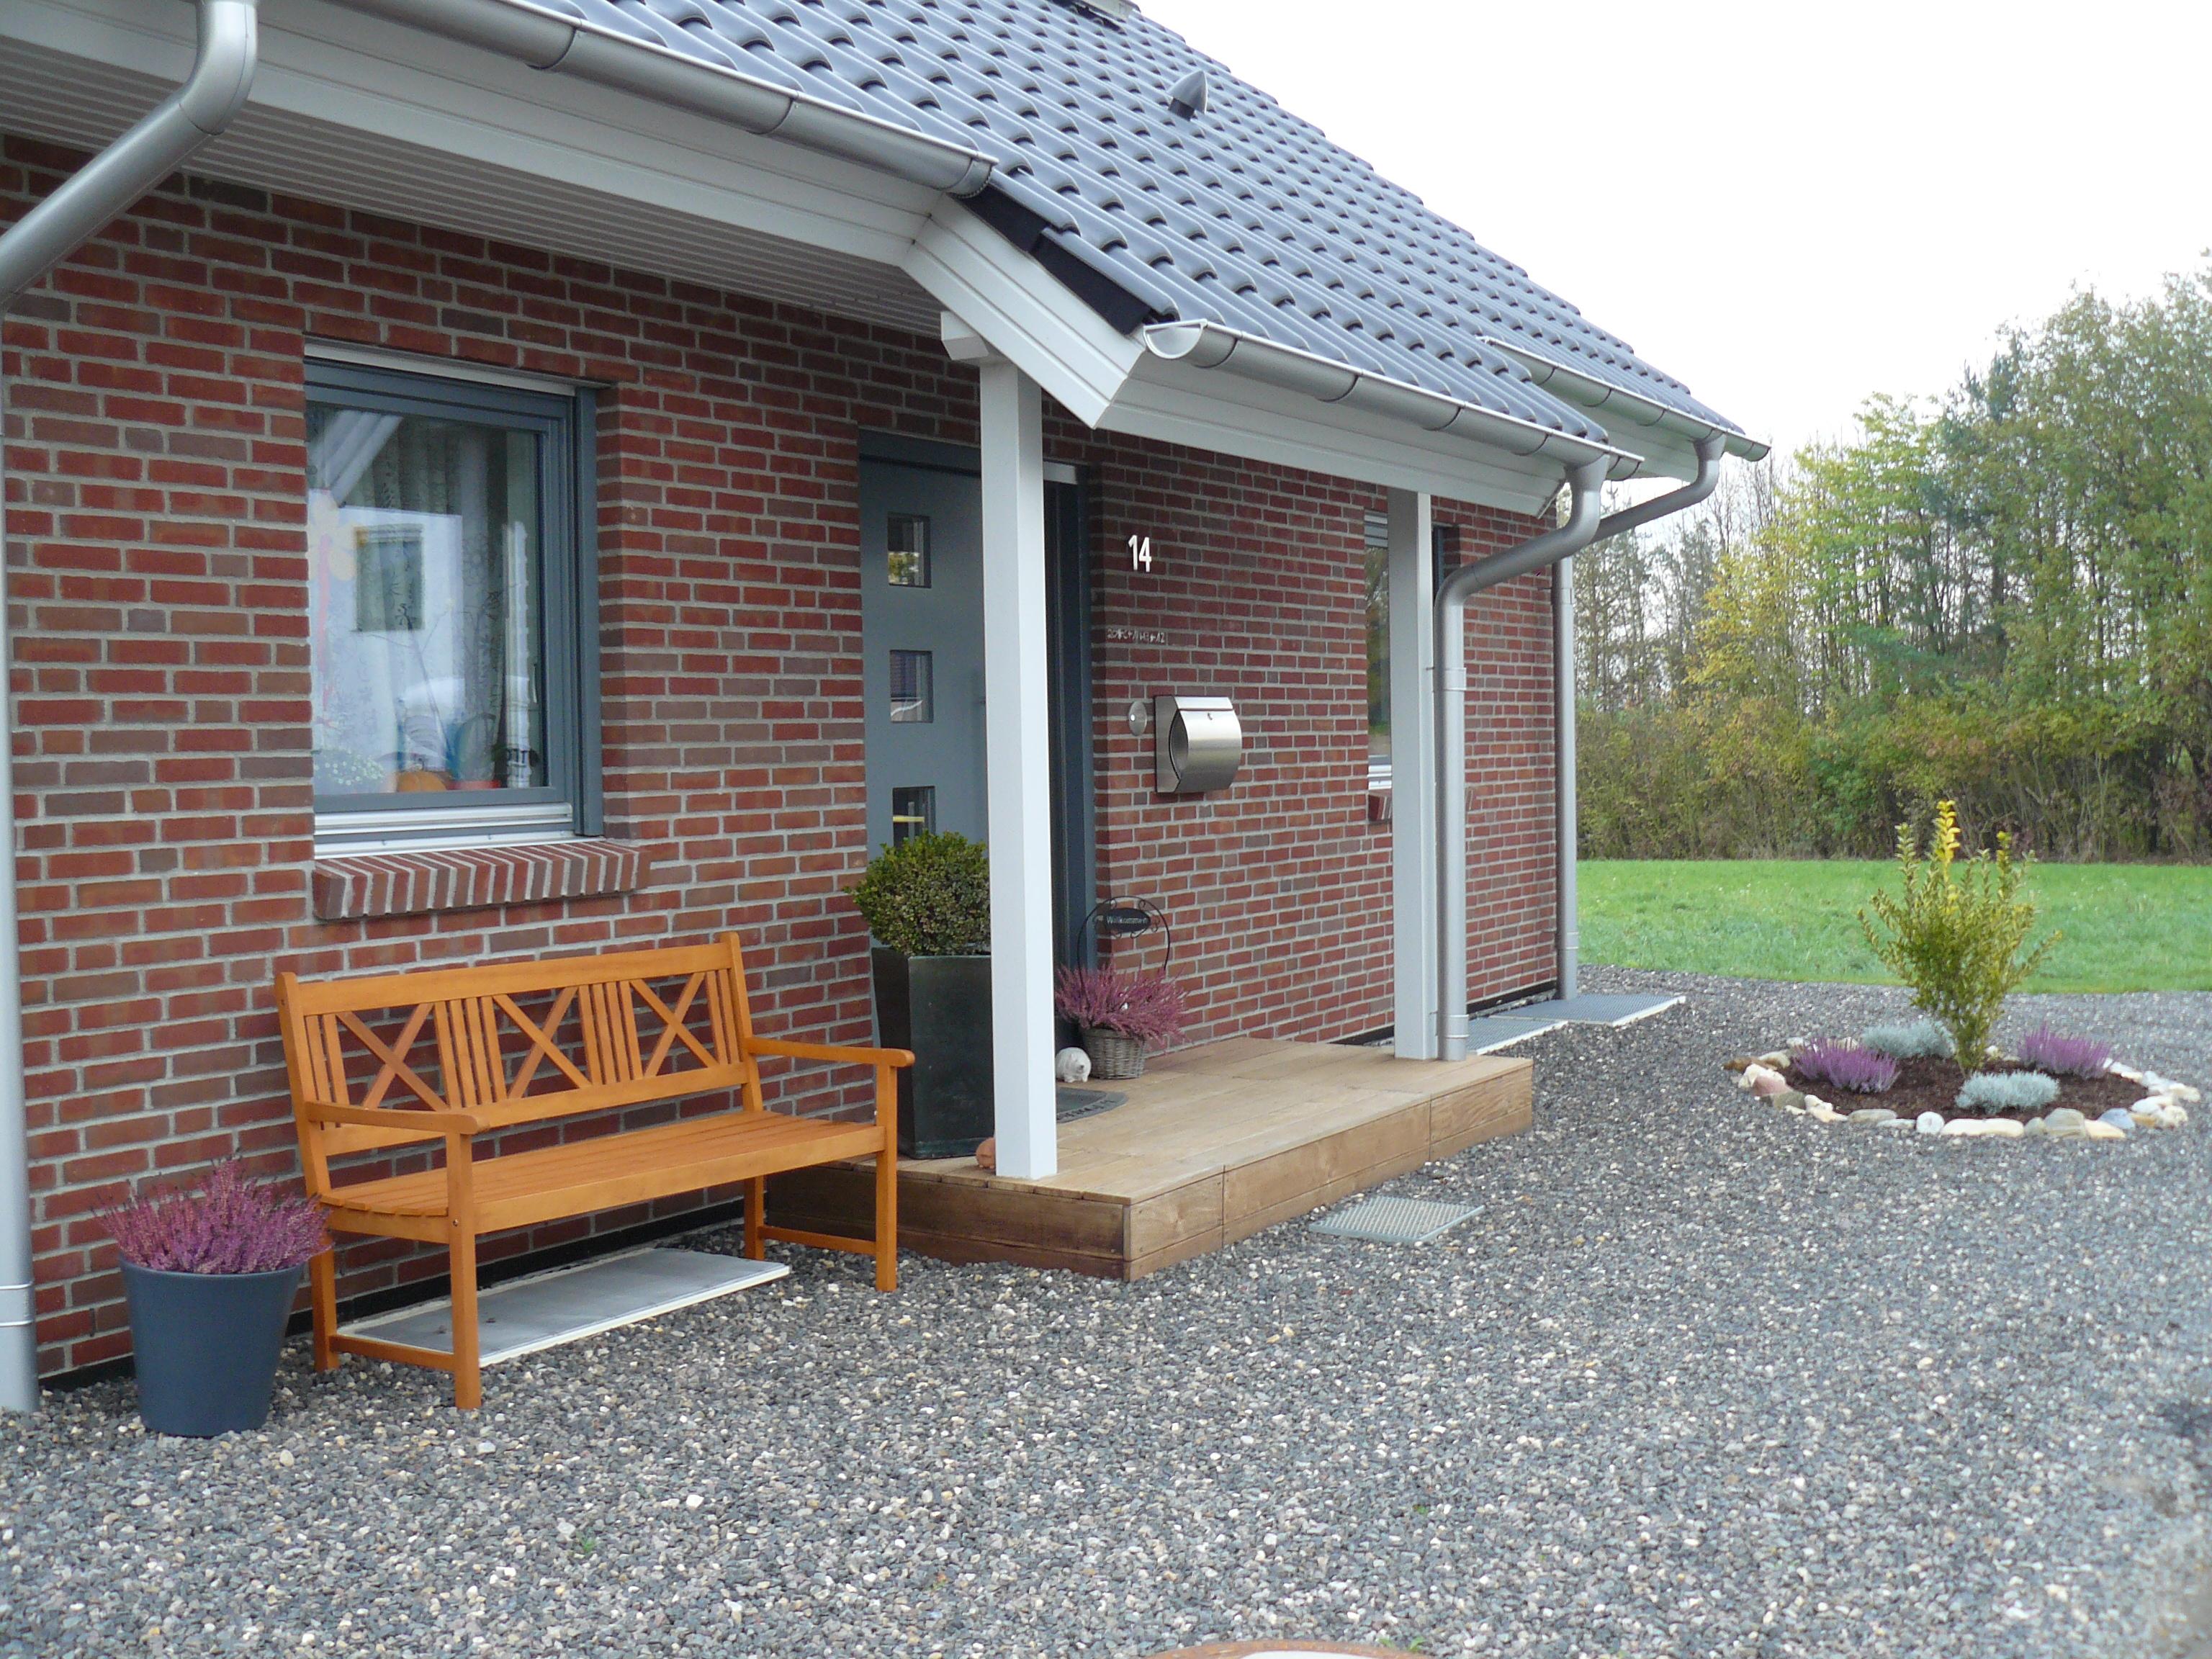 bautagebuch fronhoven h uschen. Black Bedroom Furniture Sets. Home Design Ideas